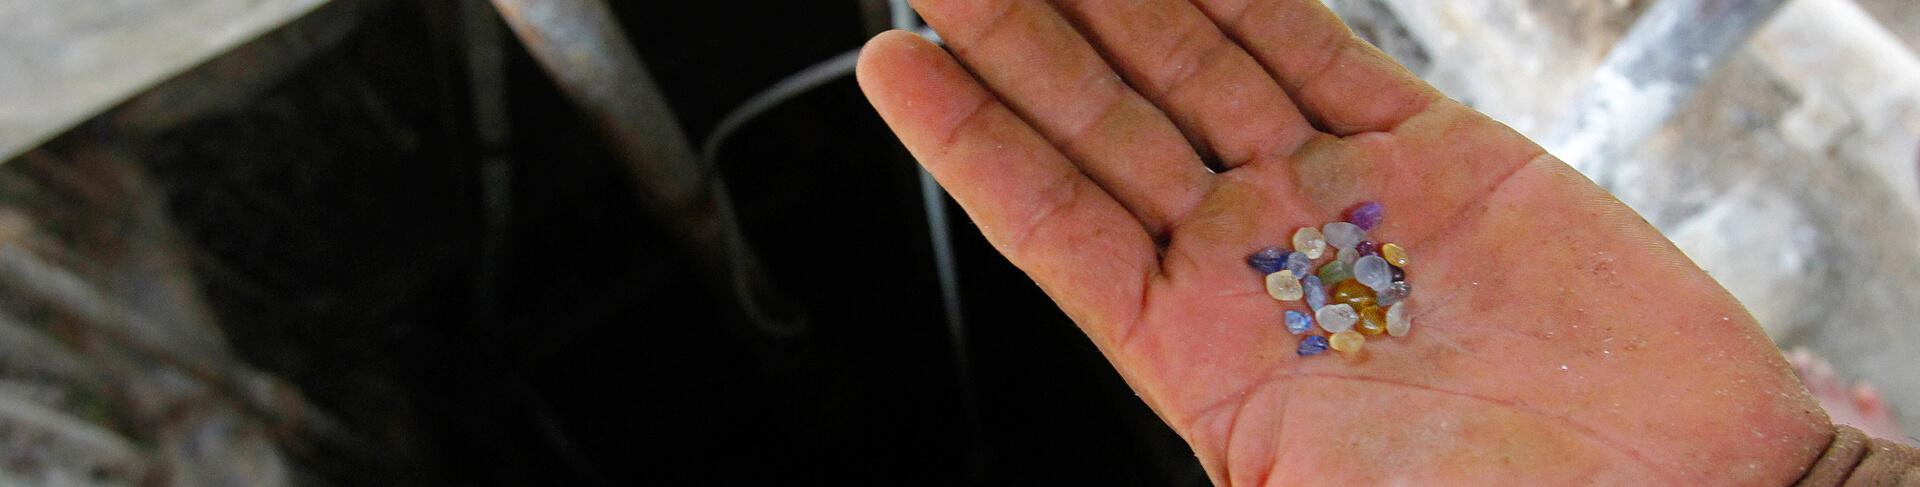 Sri Lankan Sapphire Miner Holding Fair Trade Gems